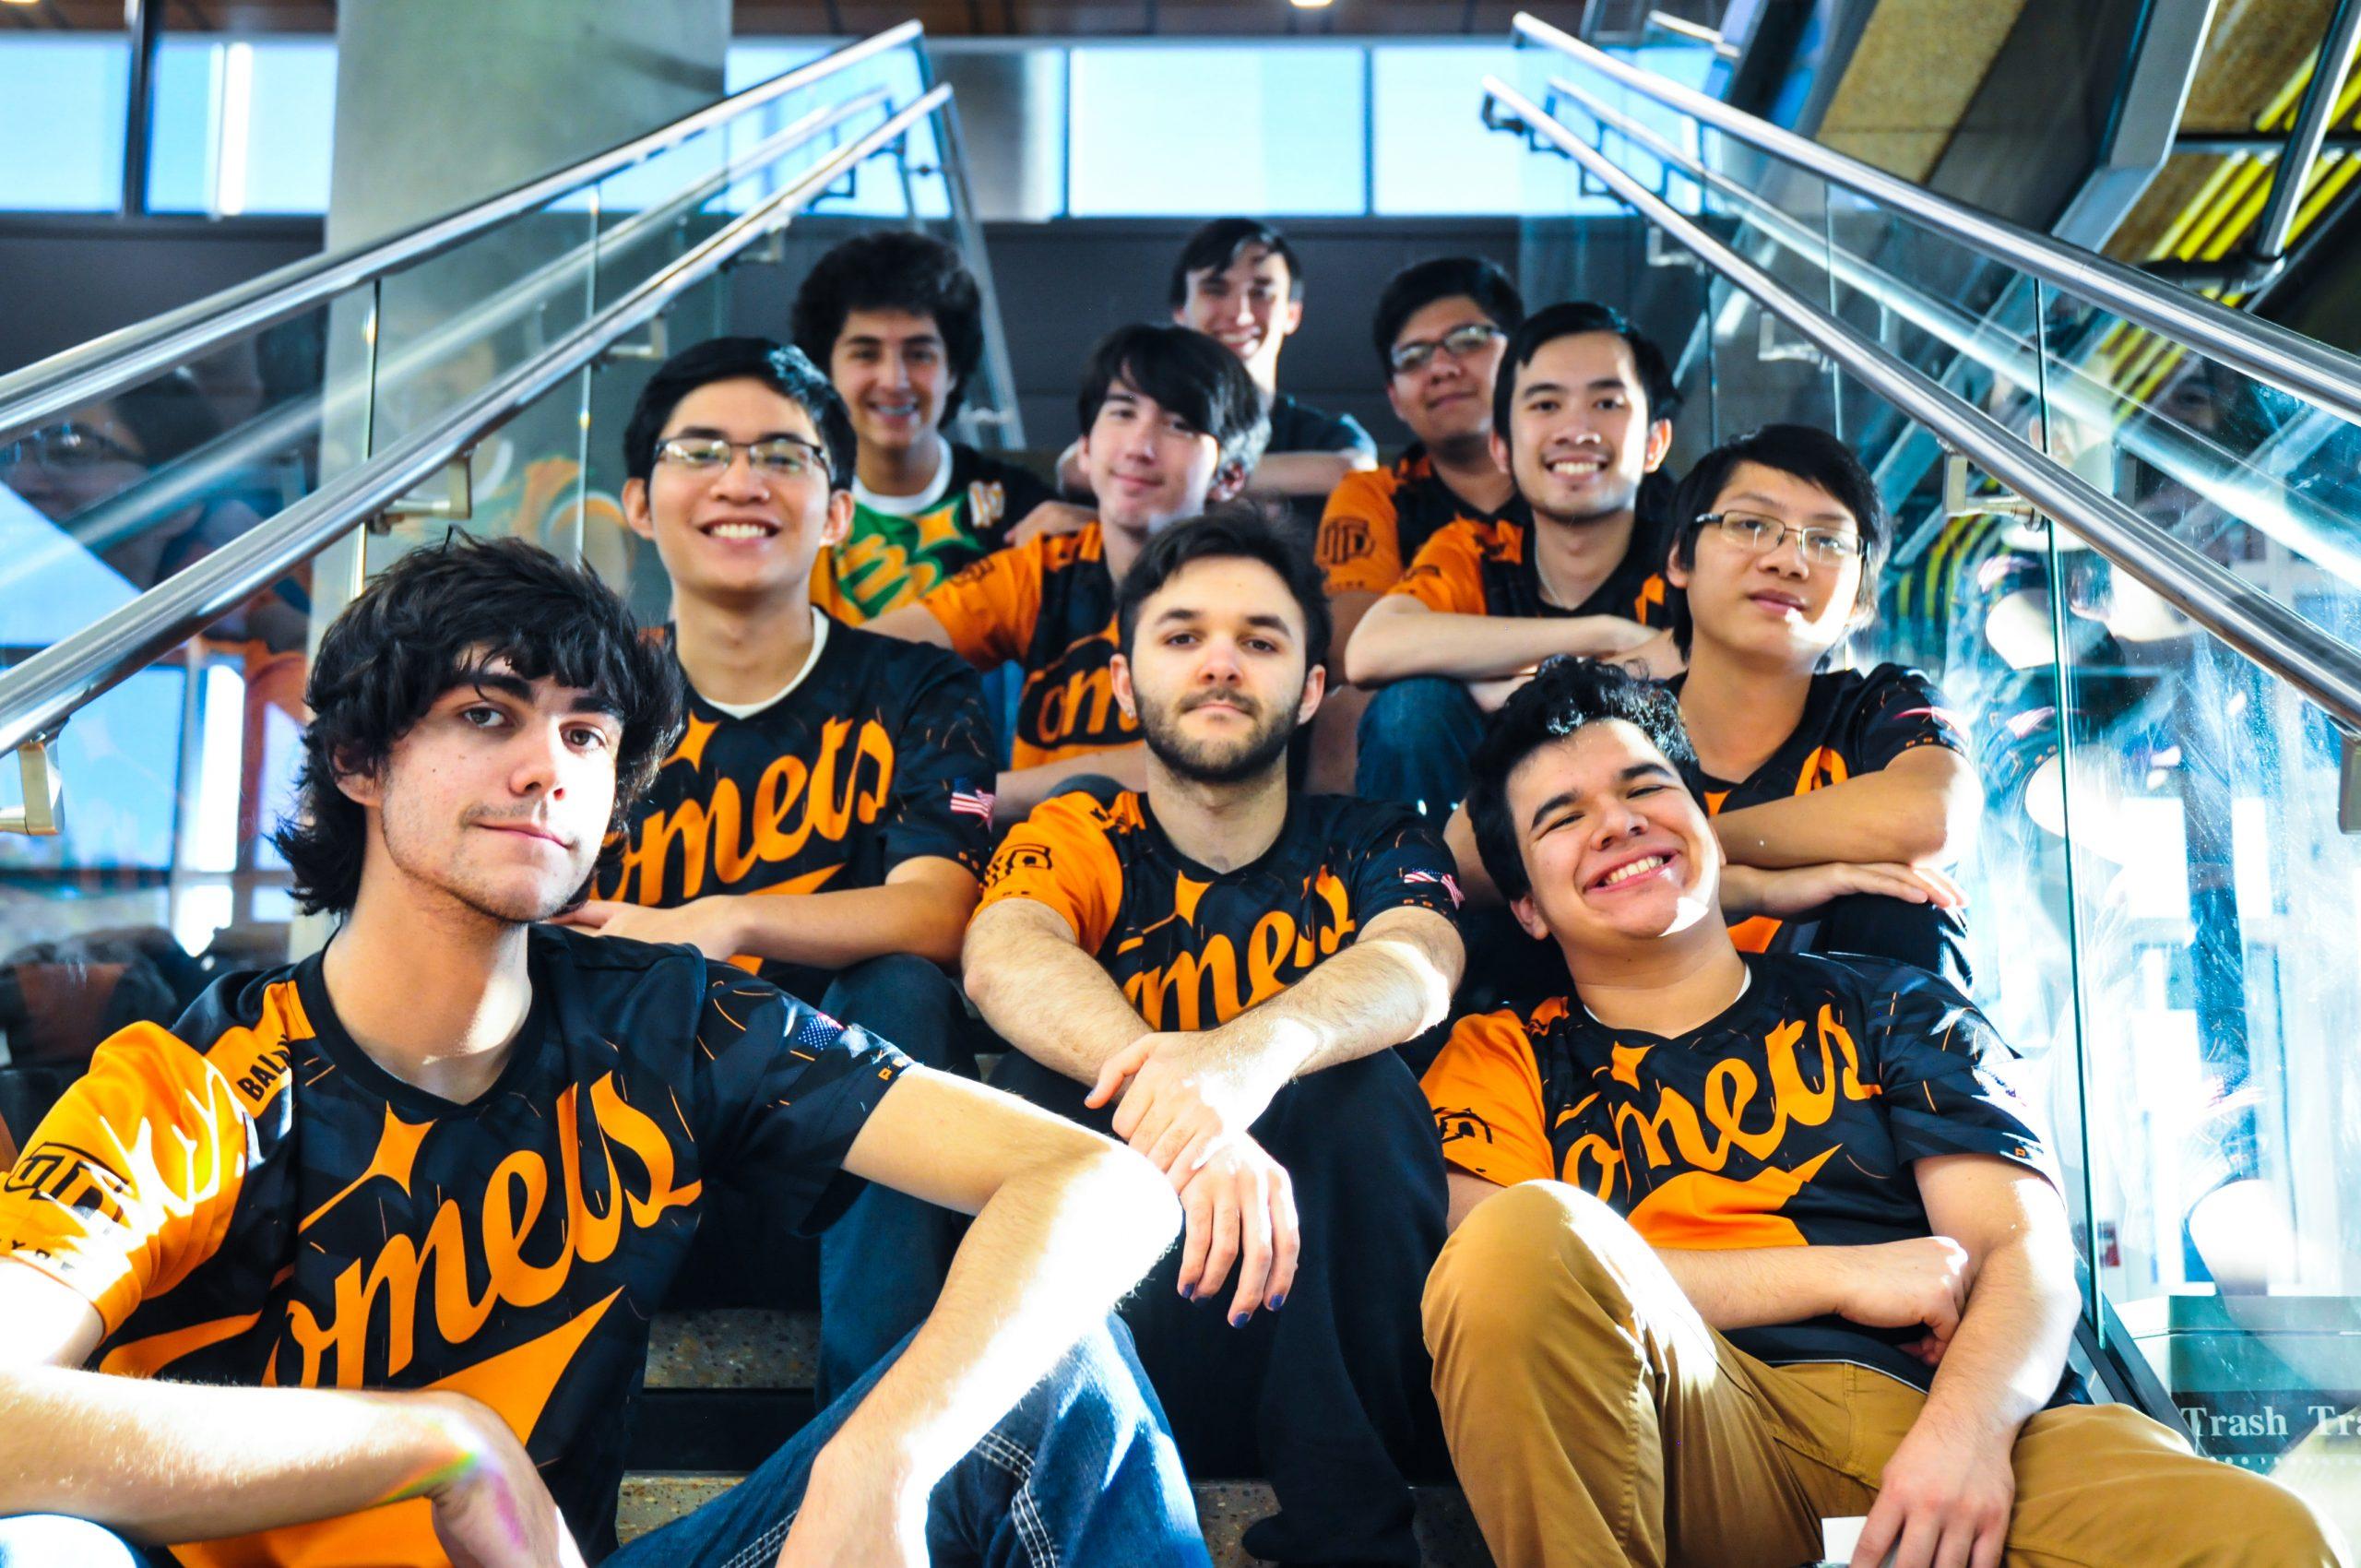 Smash team hosts recruitment tournaments